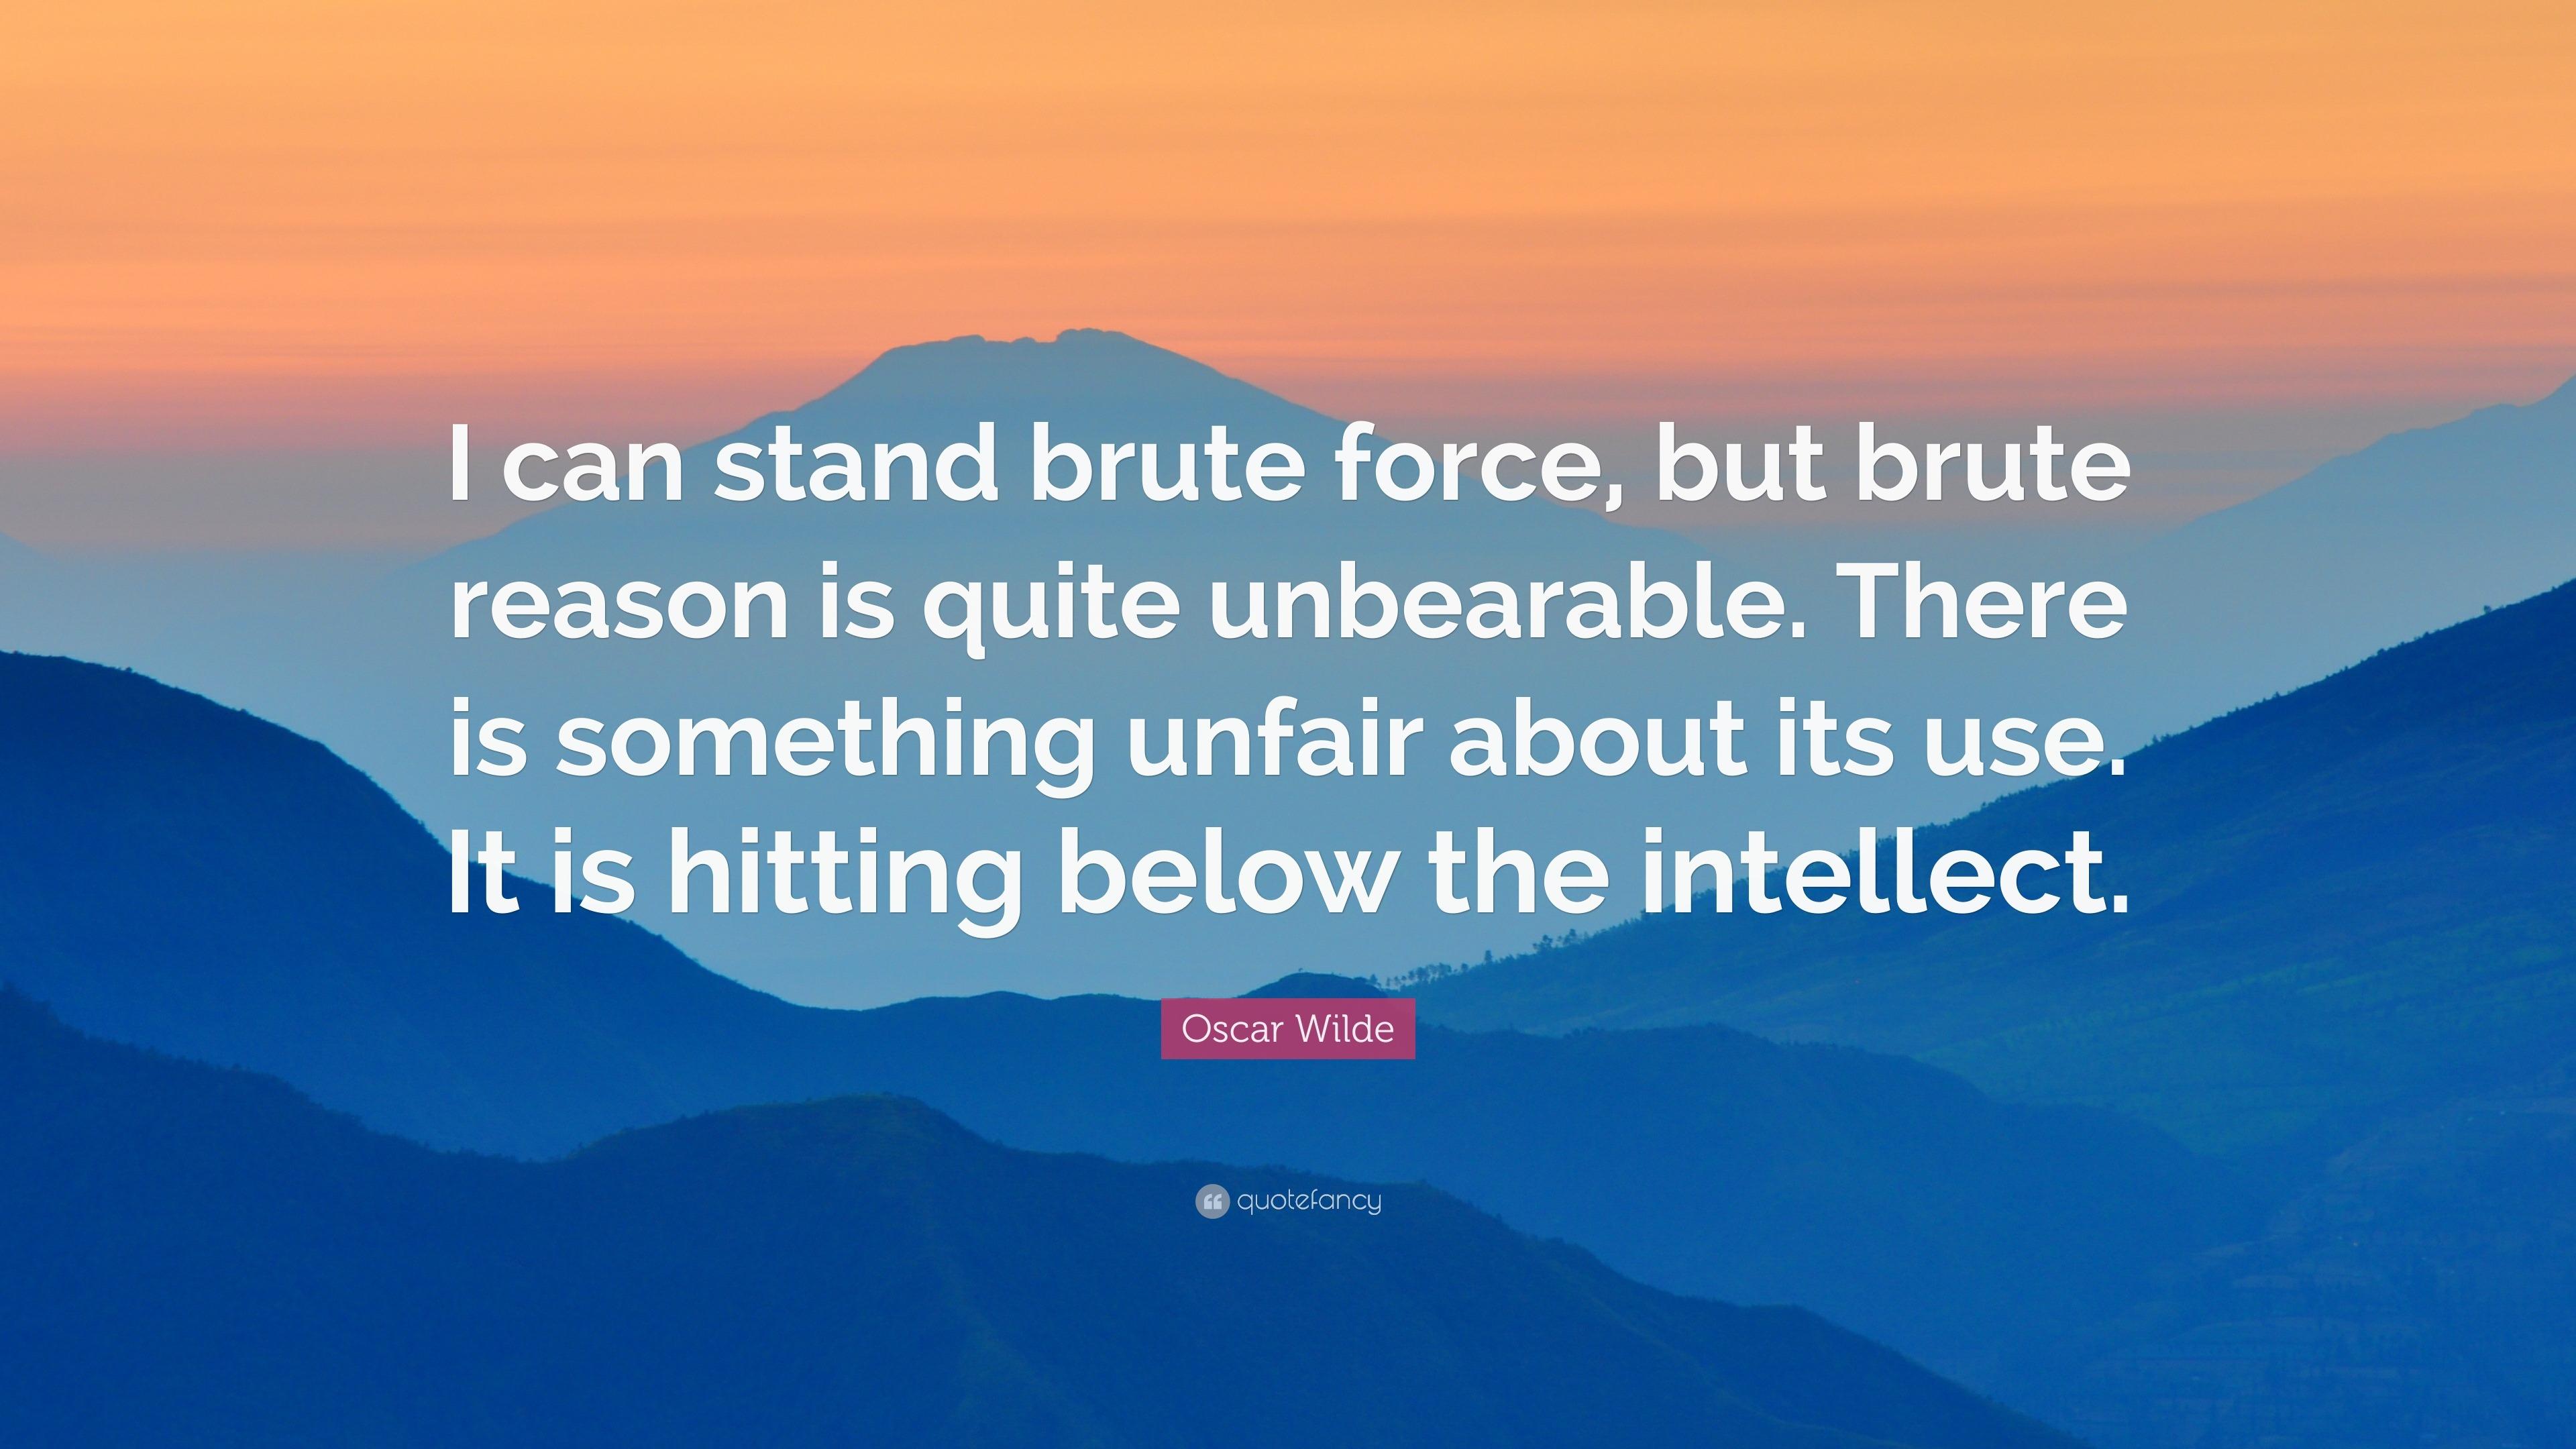 Резултат с изображение за i can stand brute force but brute reason is quite unbearable